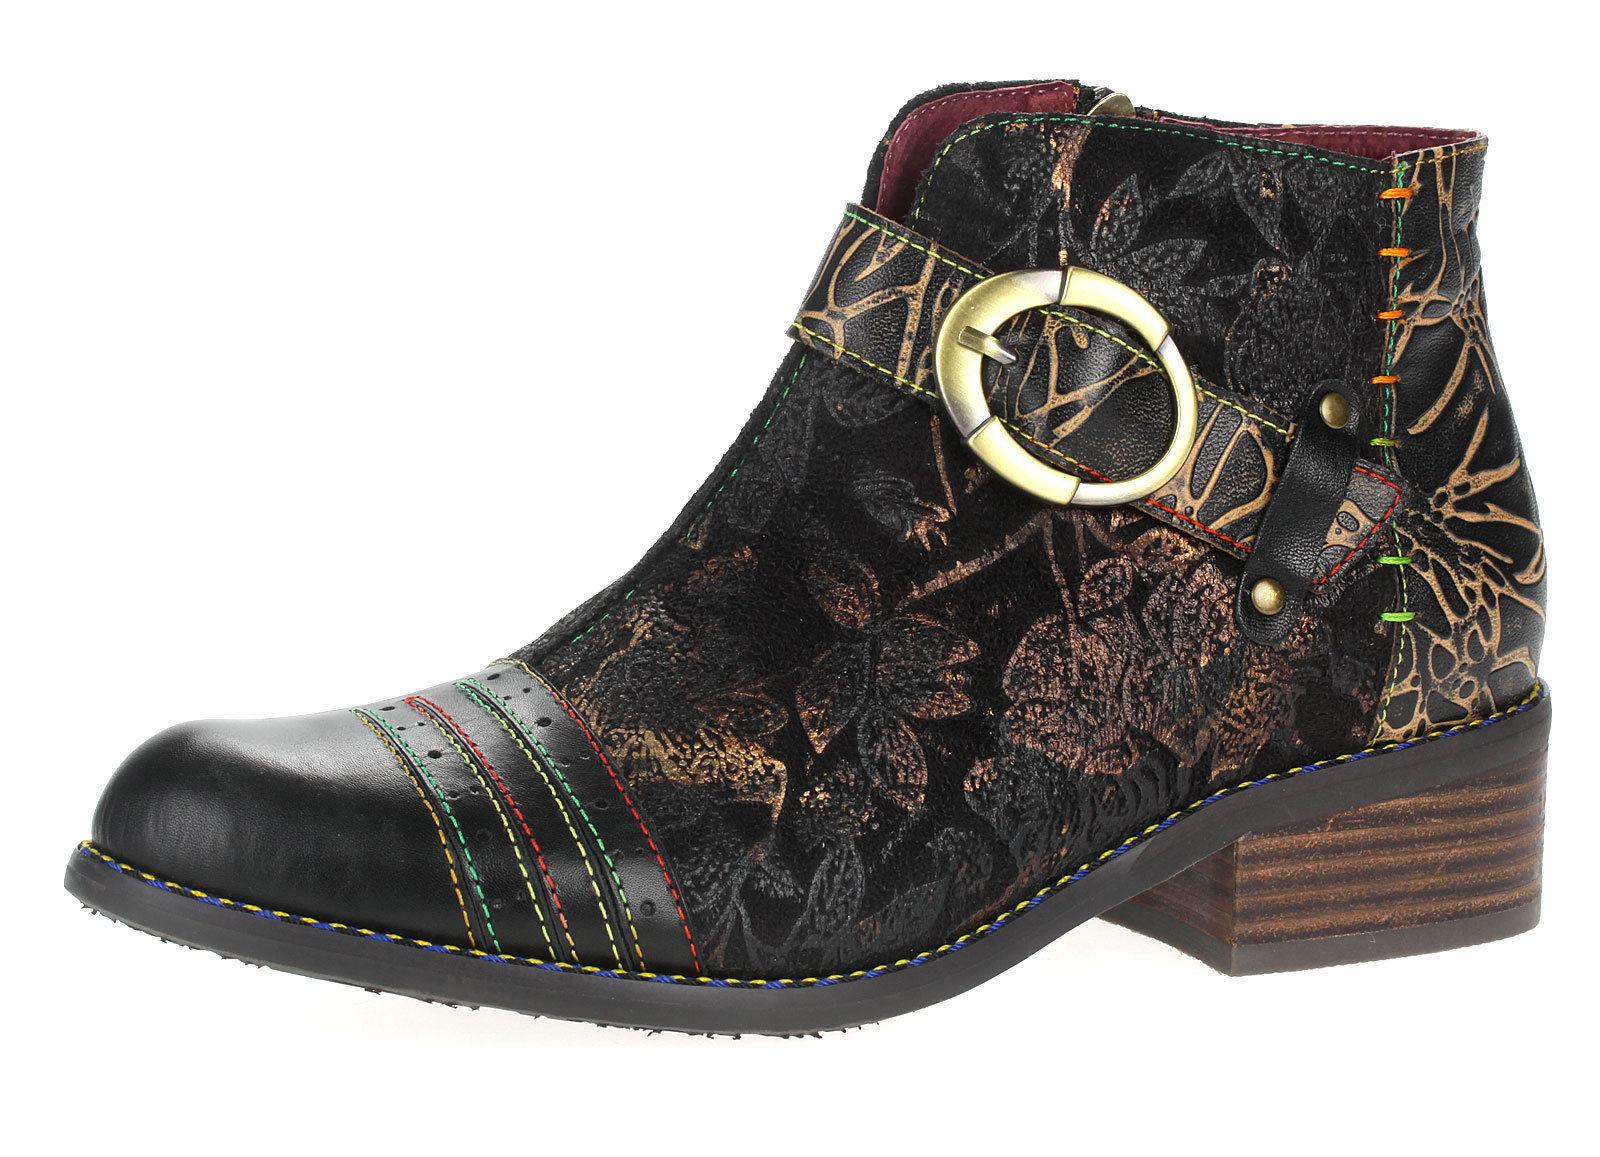 5253afca7e9ddc Laura Vita Damen Leder Boots Booty Stiefeletten Schwarz Alice 12